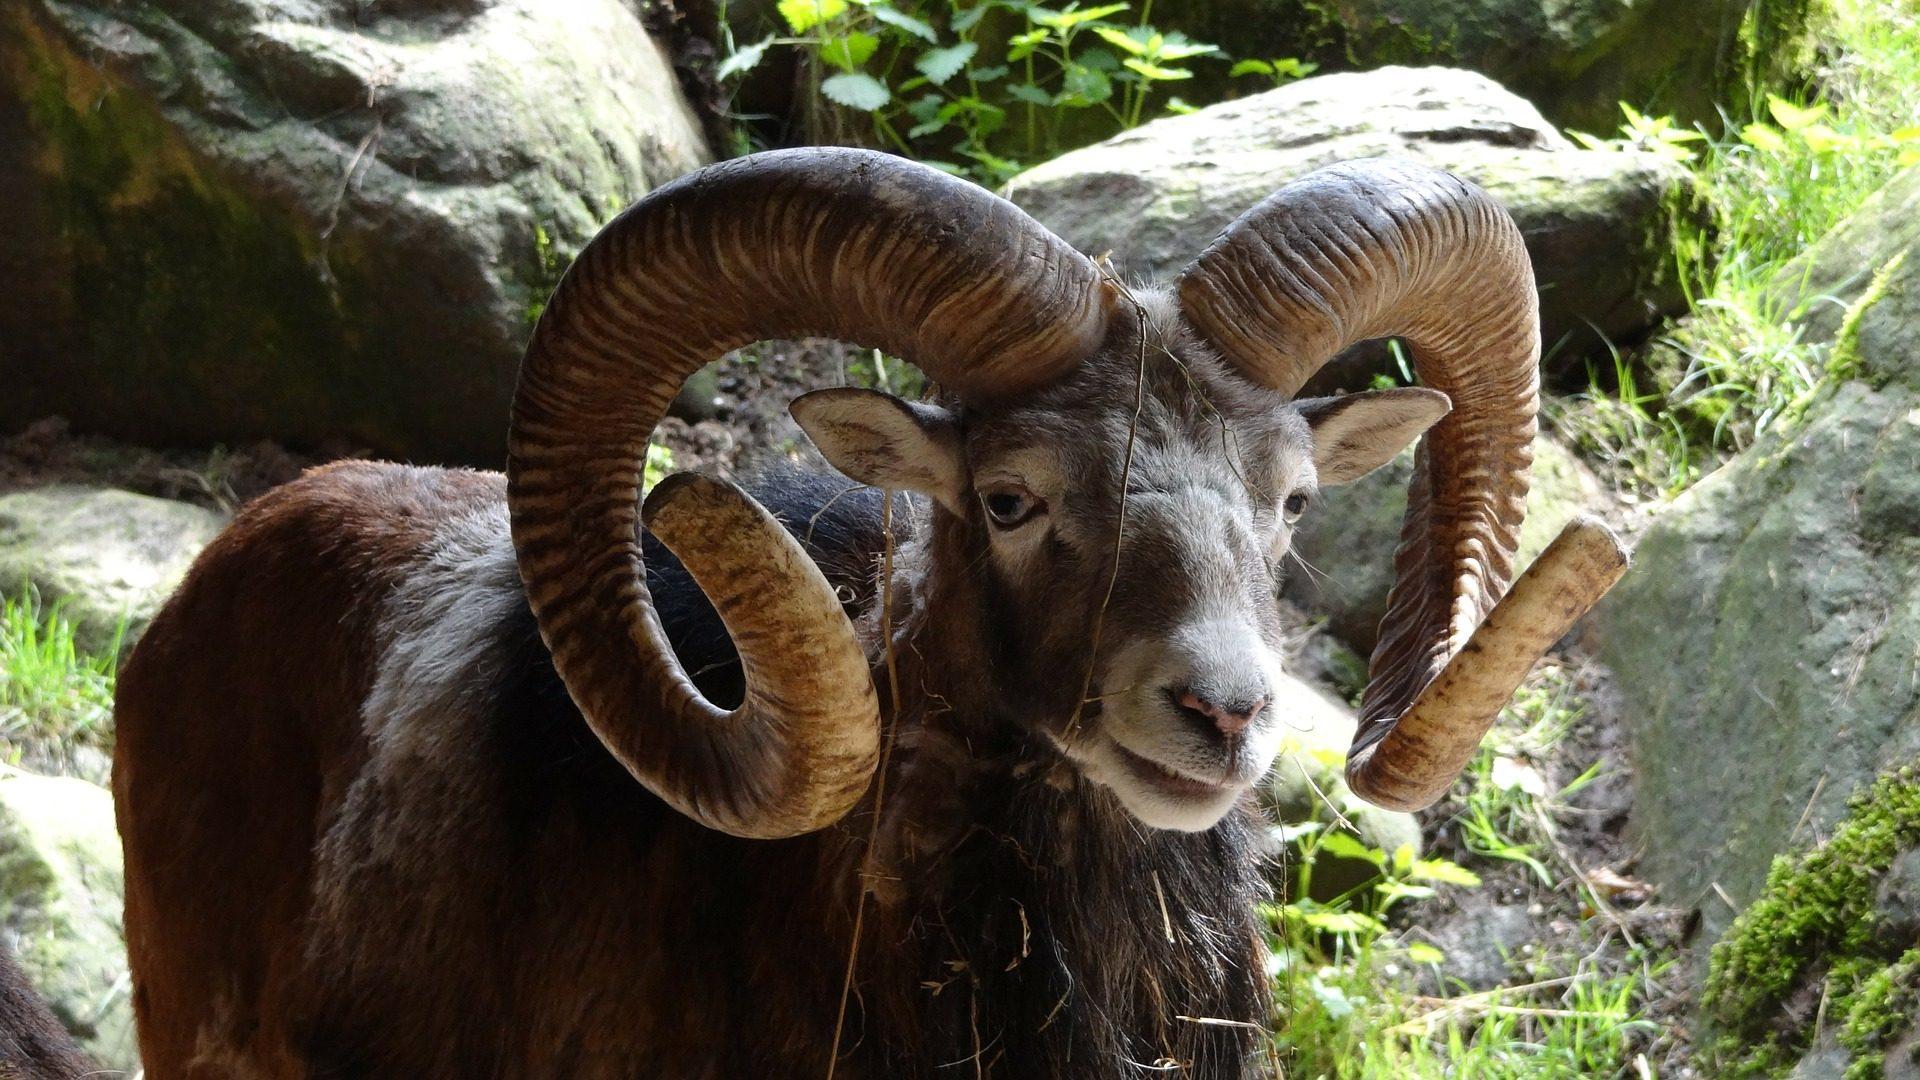 carnero, 山羊, 喇叭, 装载, 字段 - 高清壁纸 - 教授-falken.com